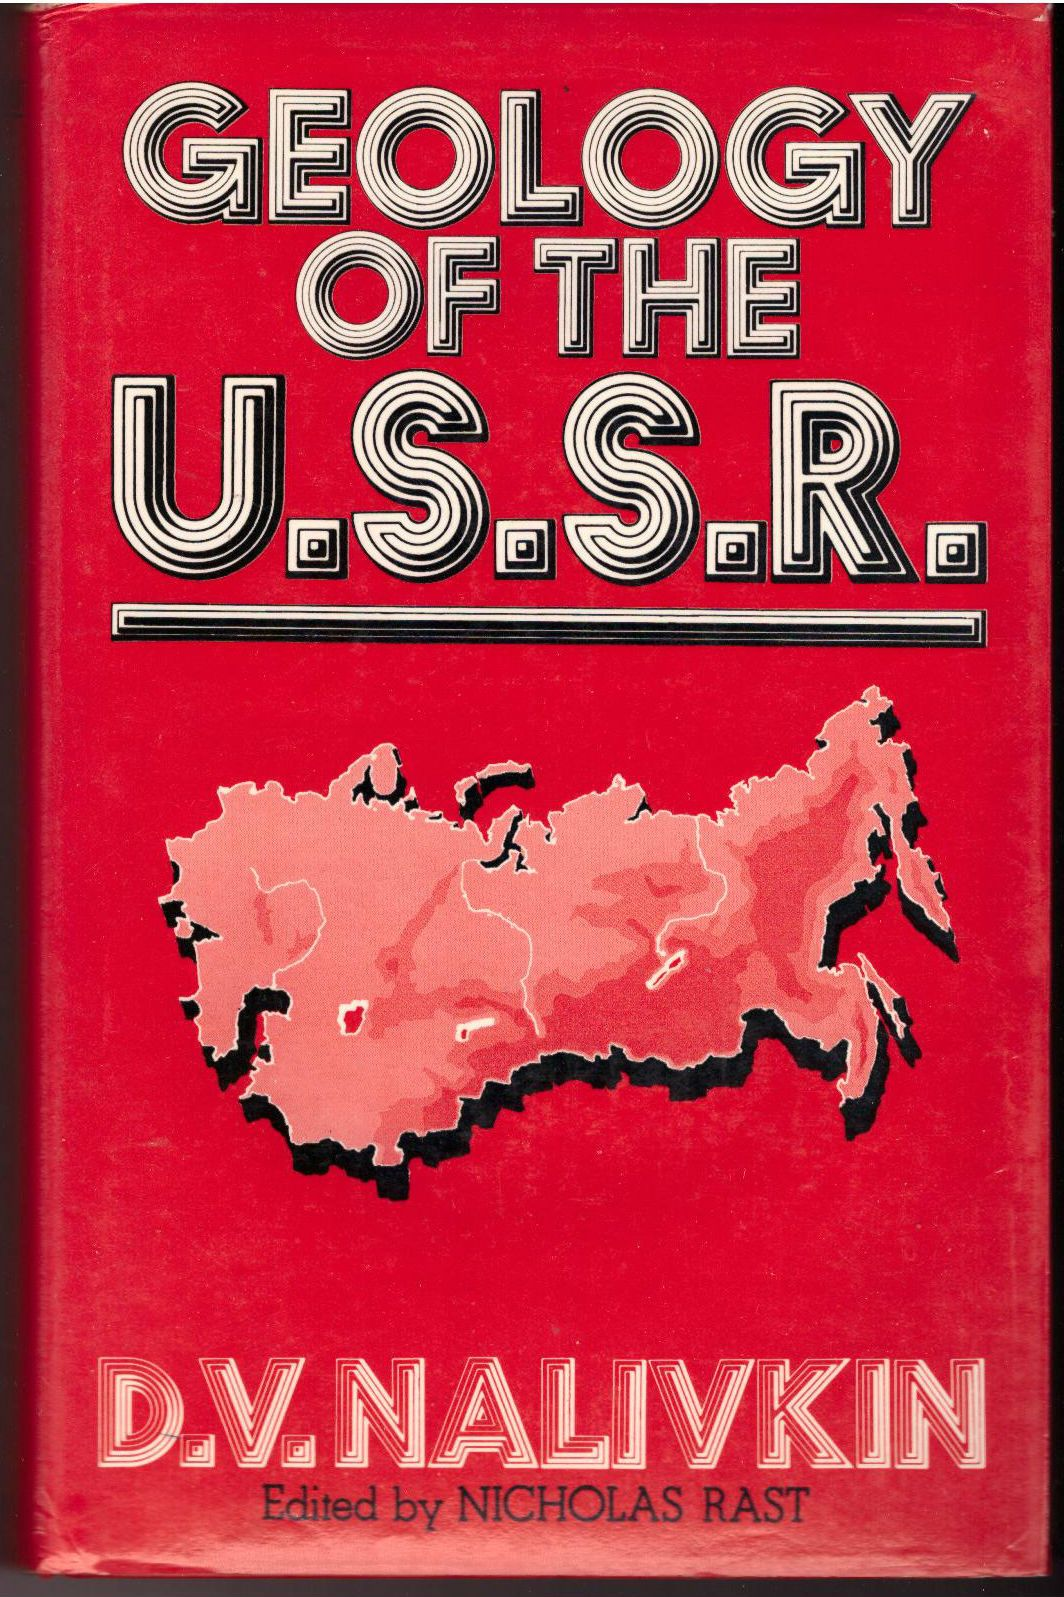 Geology of the U.S.S.R, Nalivkin, D. V